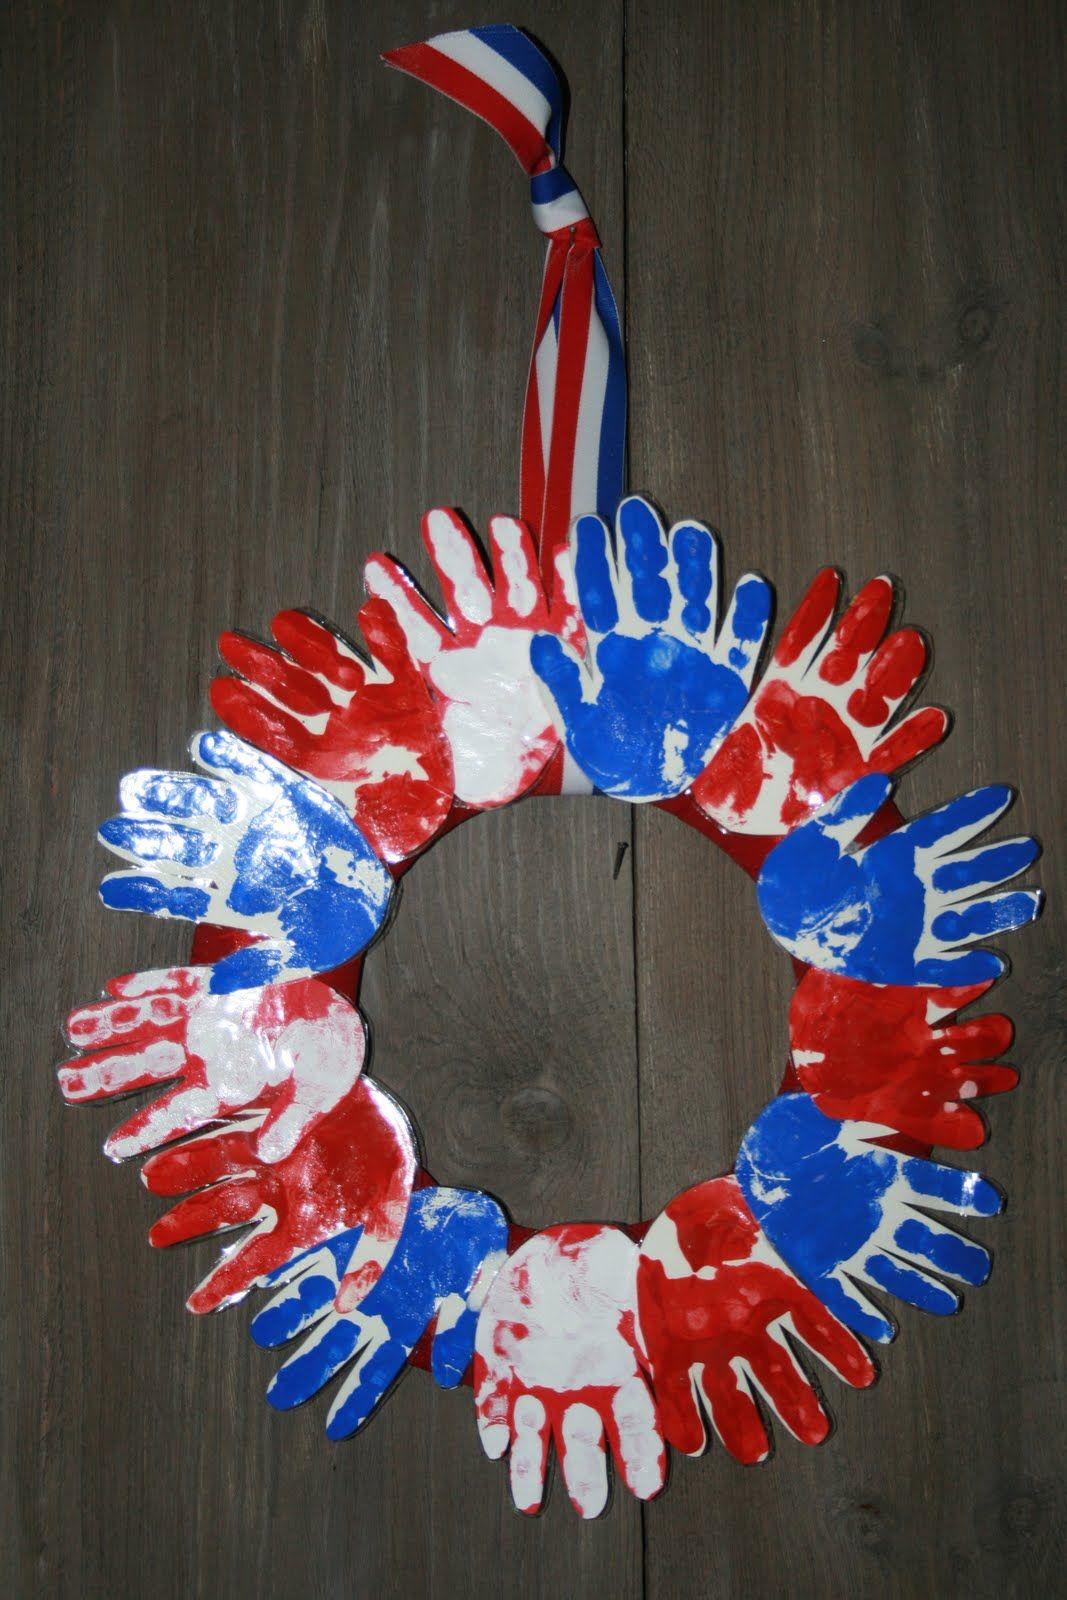 Kids' Handprint Wreath